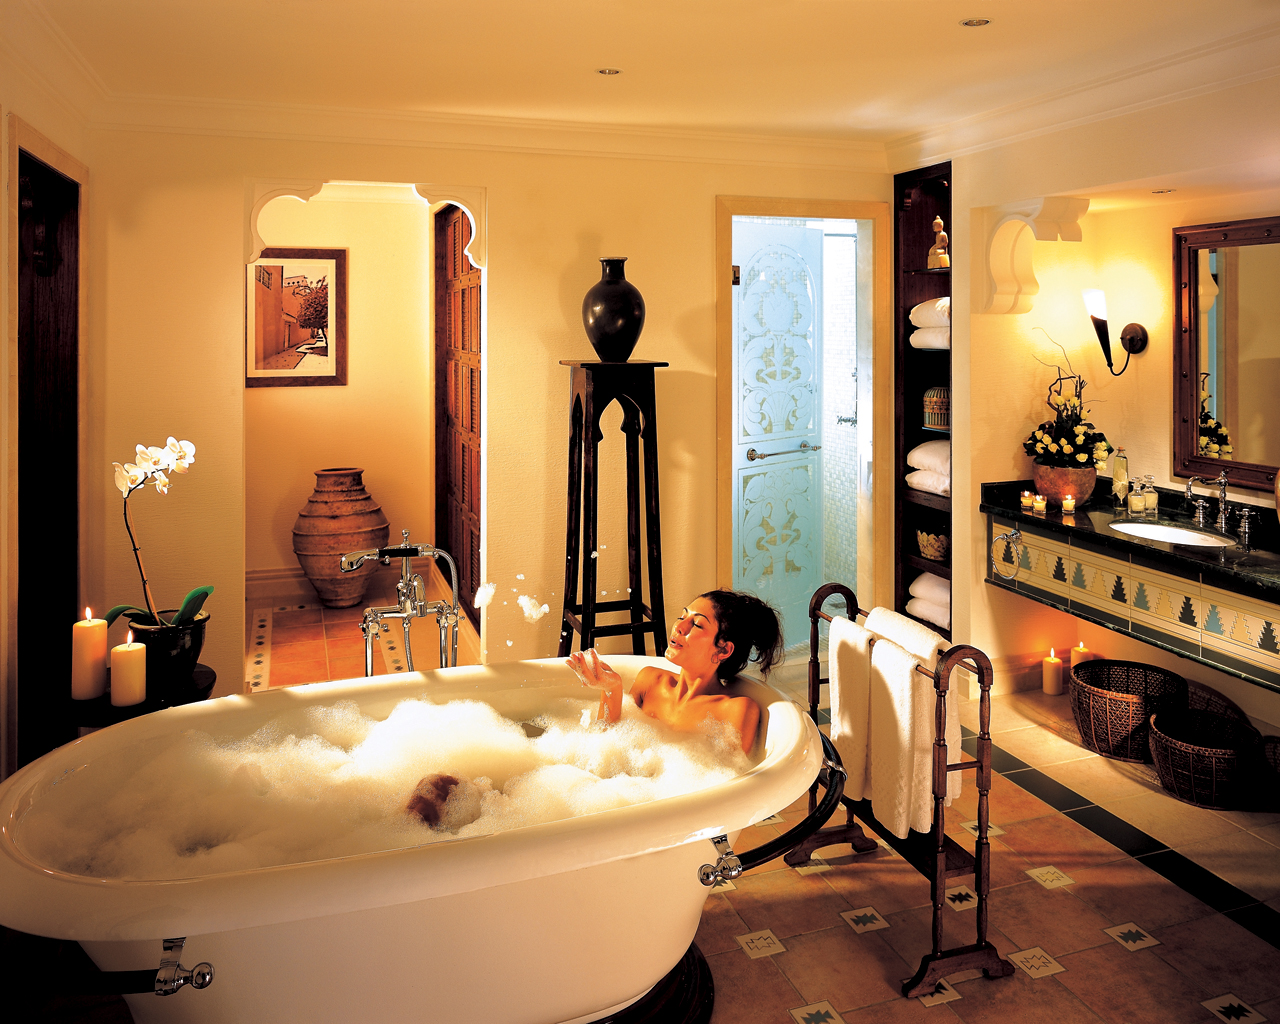 Burj Al Arab Hotel Dubai Luxury Places